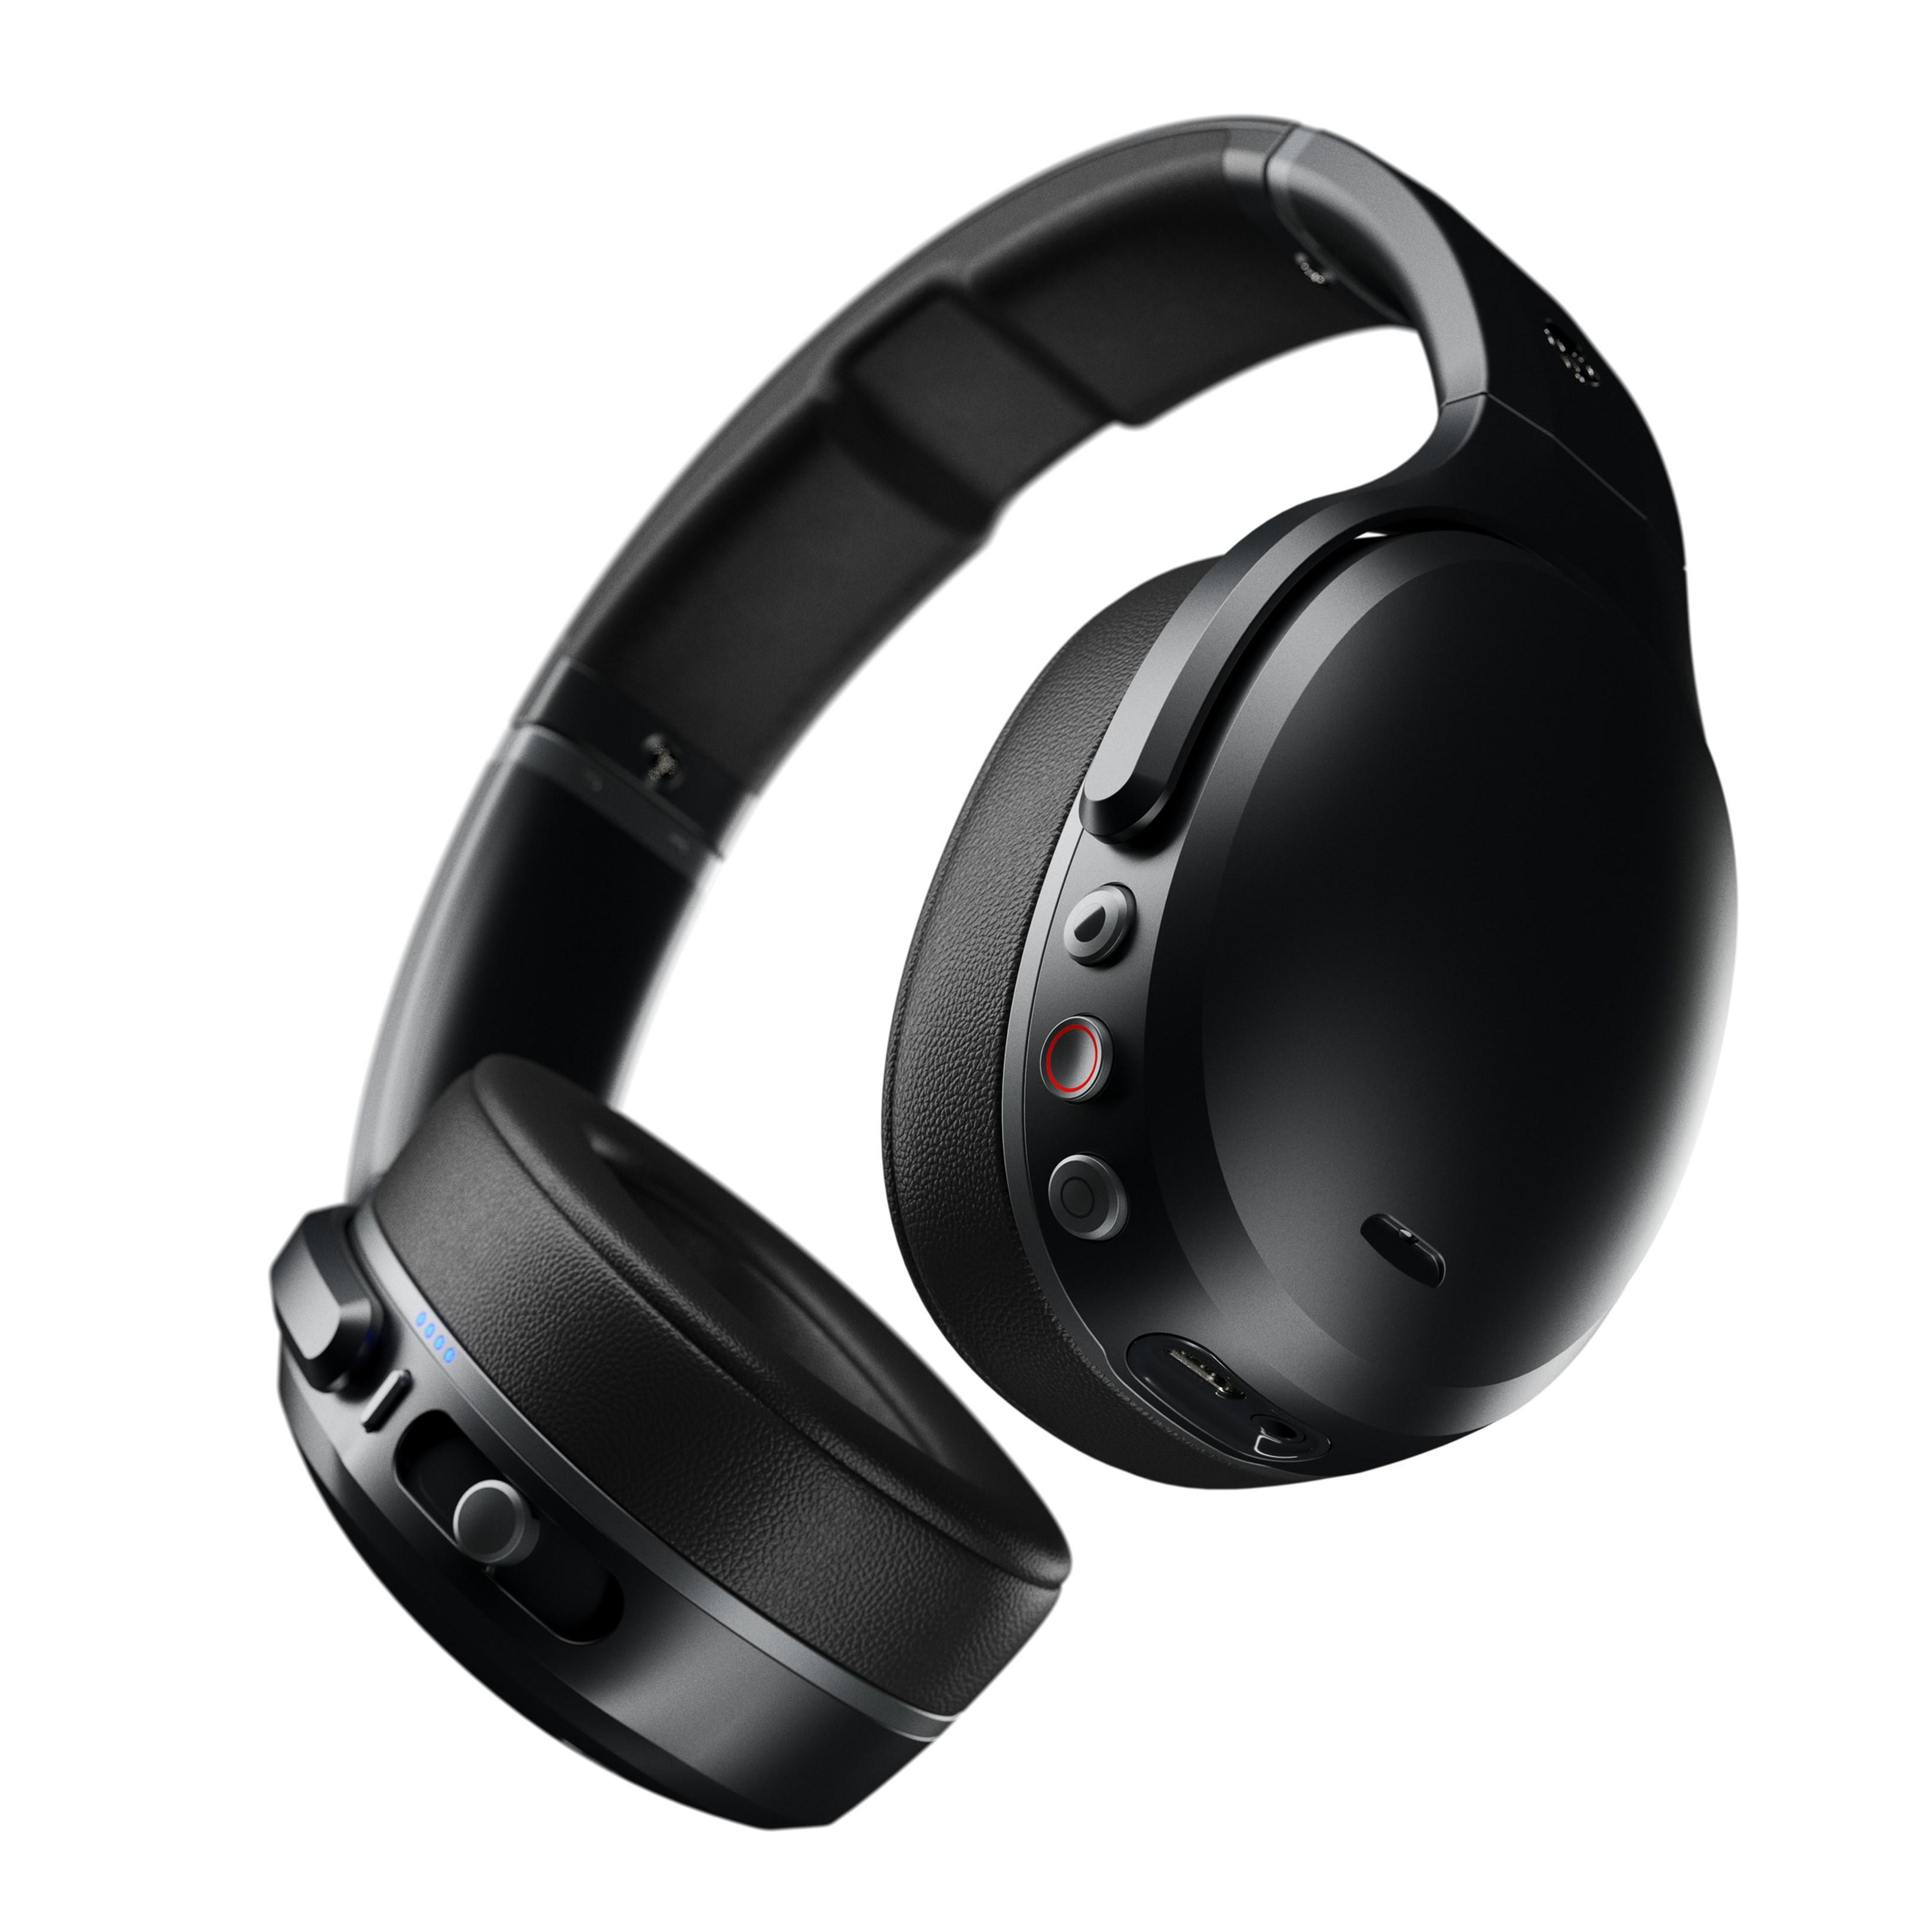 Skullcandy Crusher Black/Black/Grey Active Noise Cancelling Headphones - 1